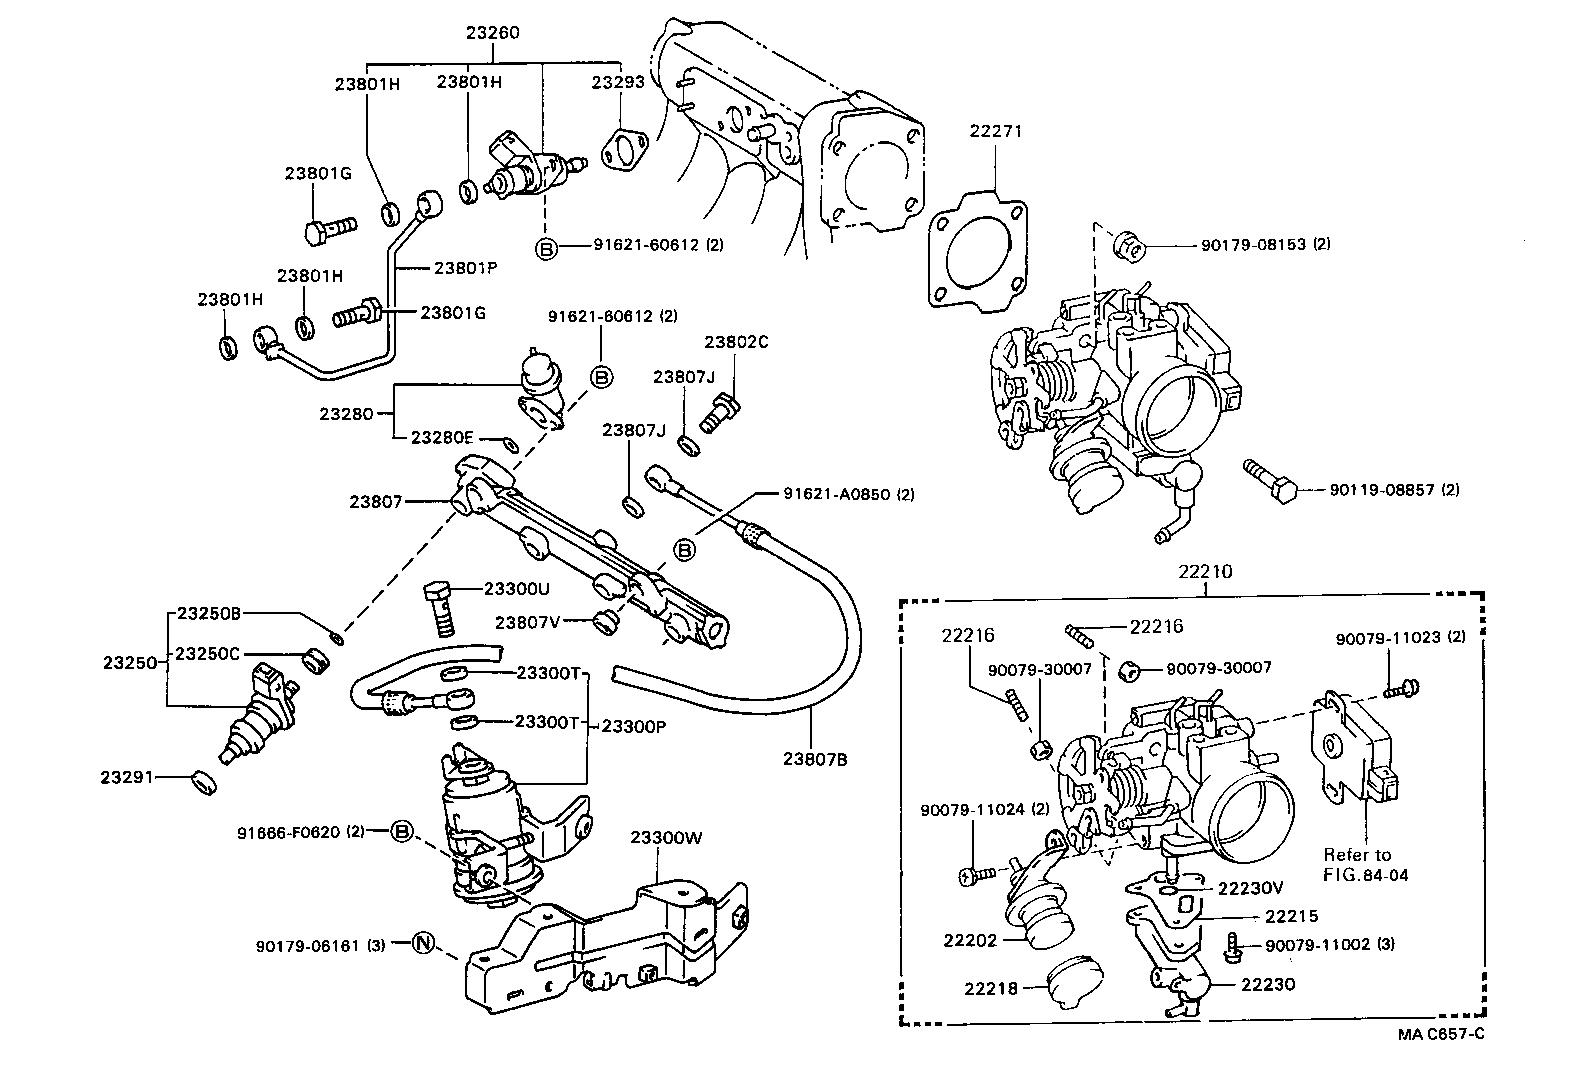 Toyota Paseo Fuel Pump Wiring Diagram Toyota Auto